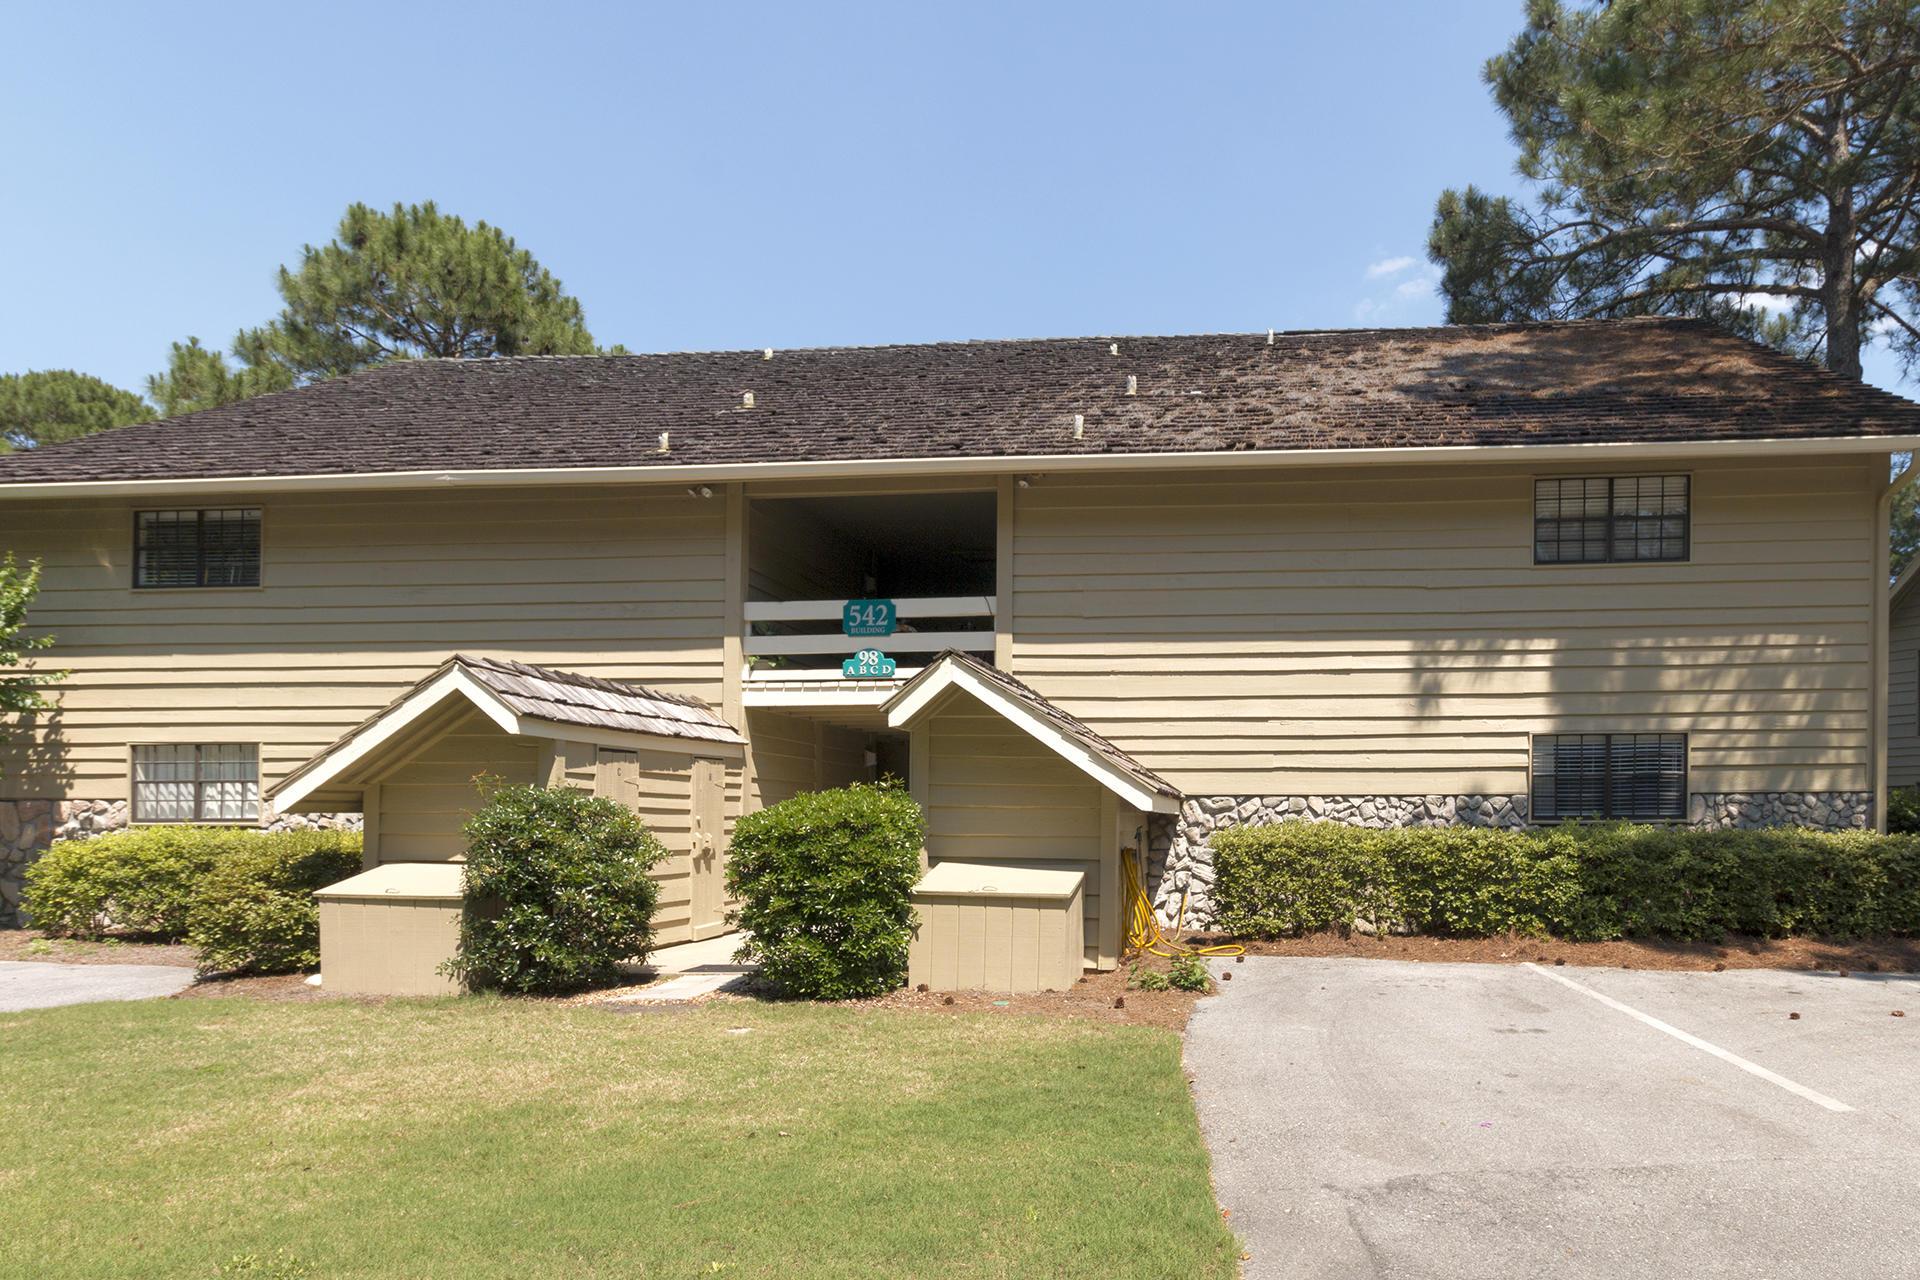 Photo of home for sale at 542 Driftwood Bay, Miramar Beach FL